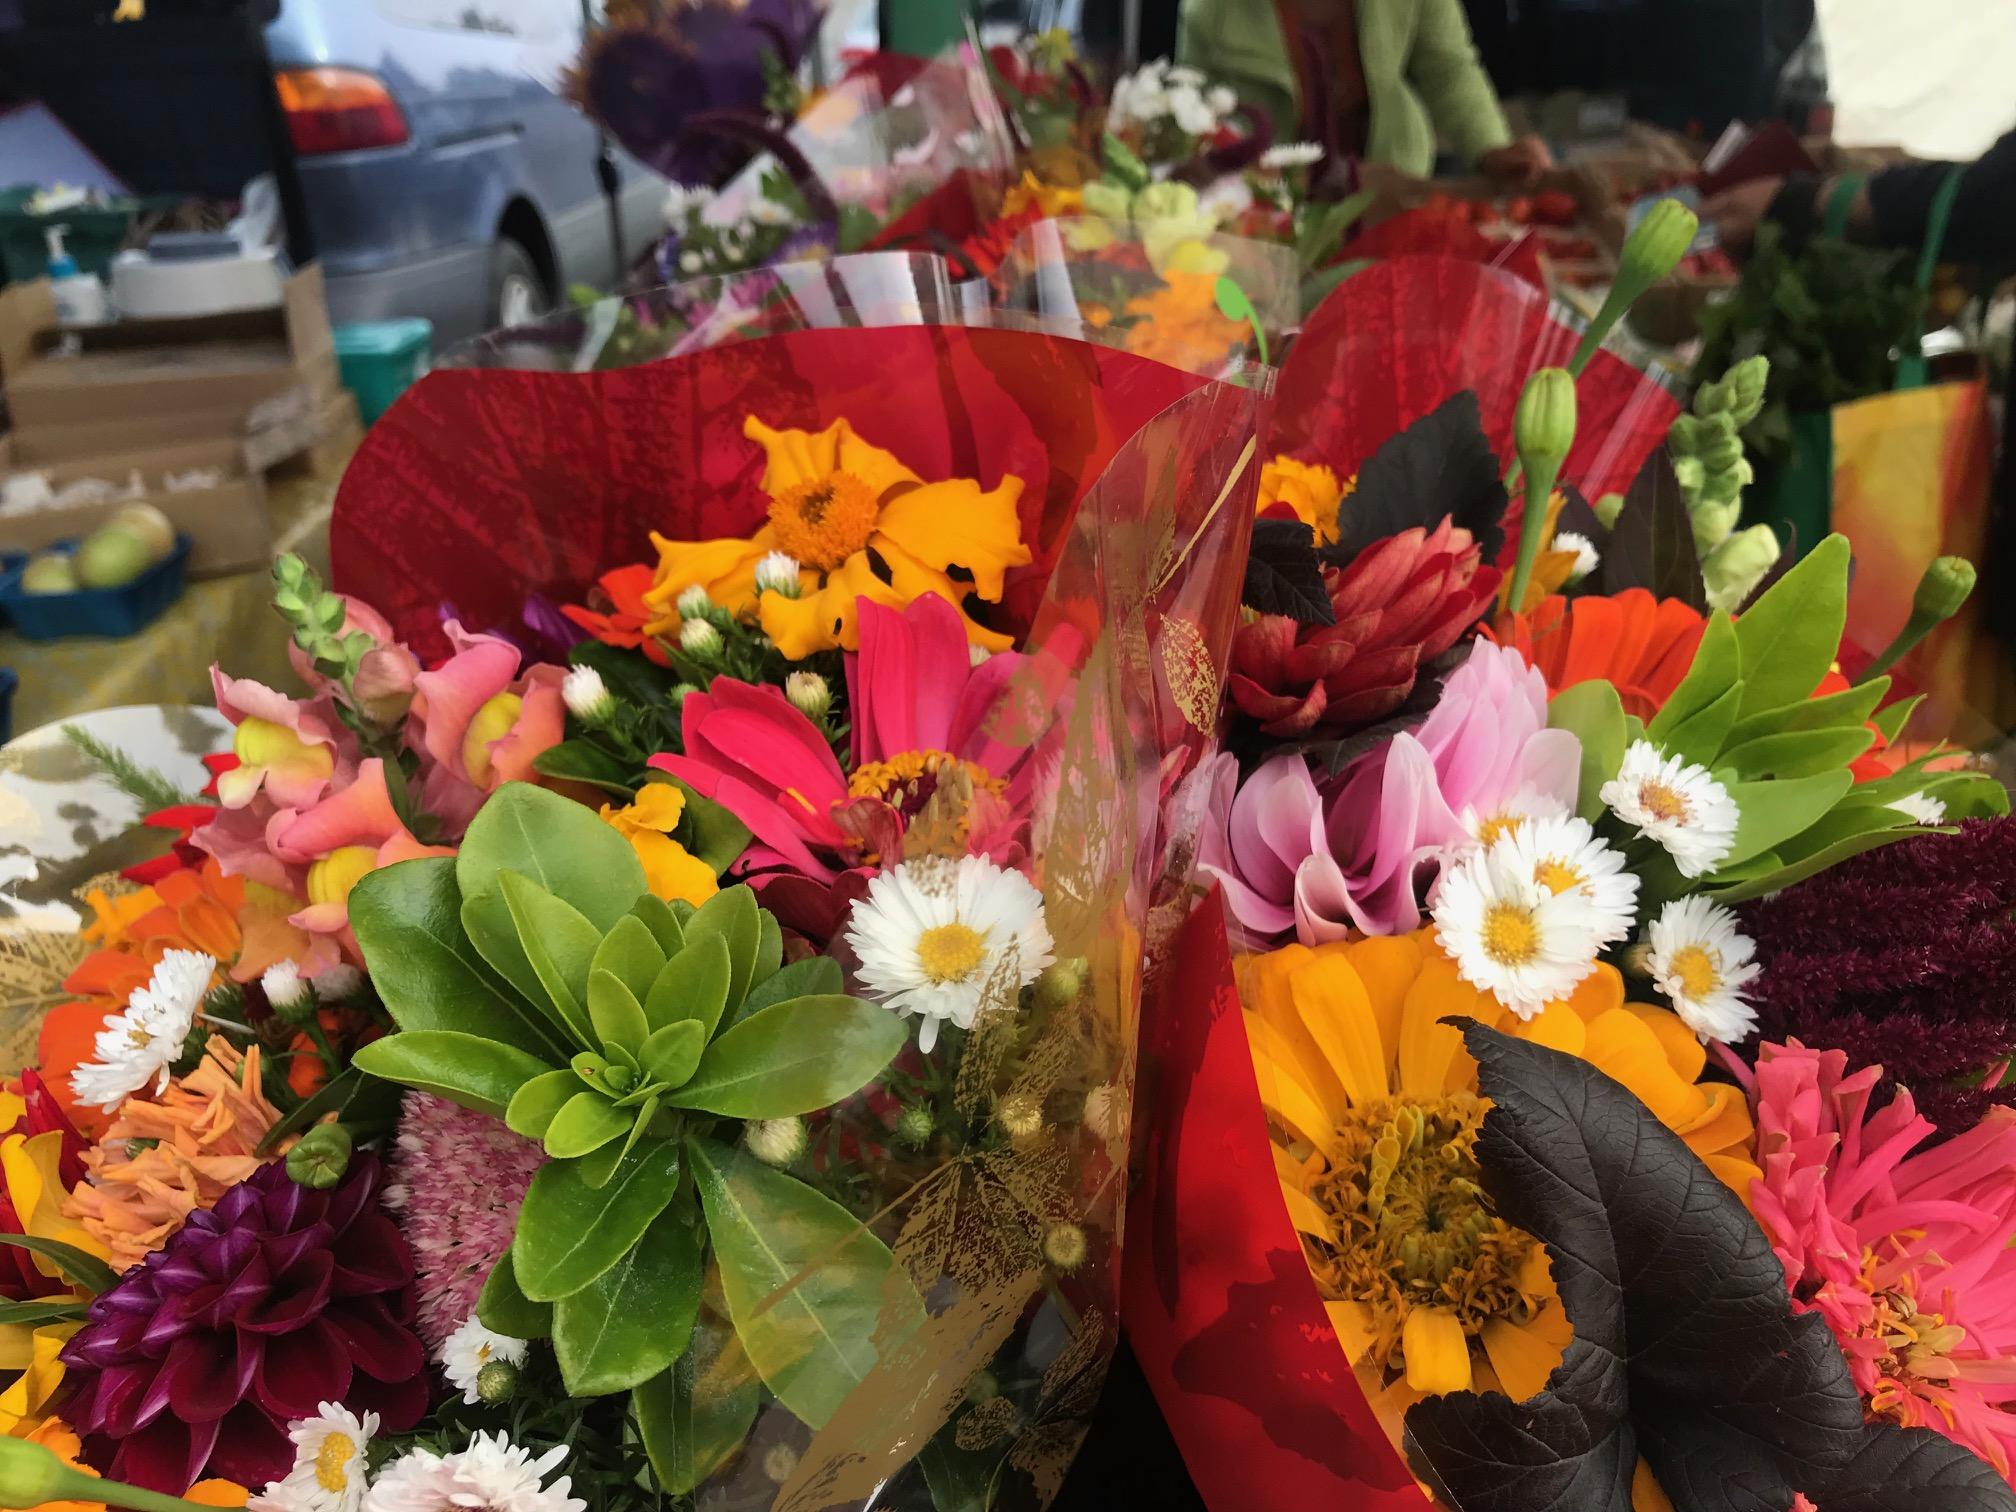 Market 10 Kate King.jpg